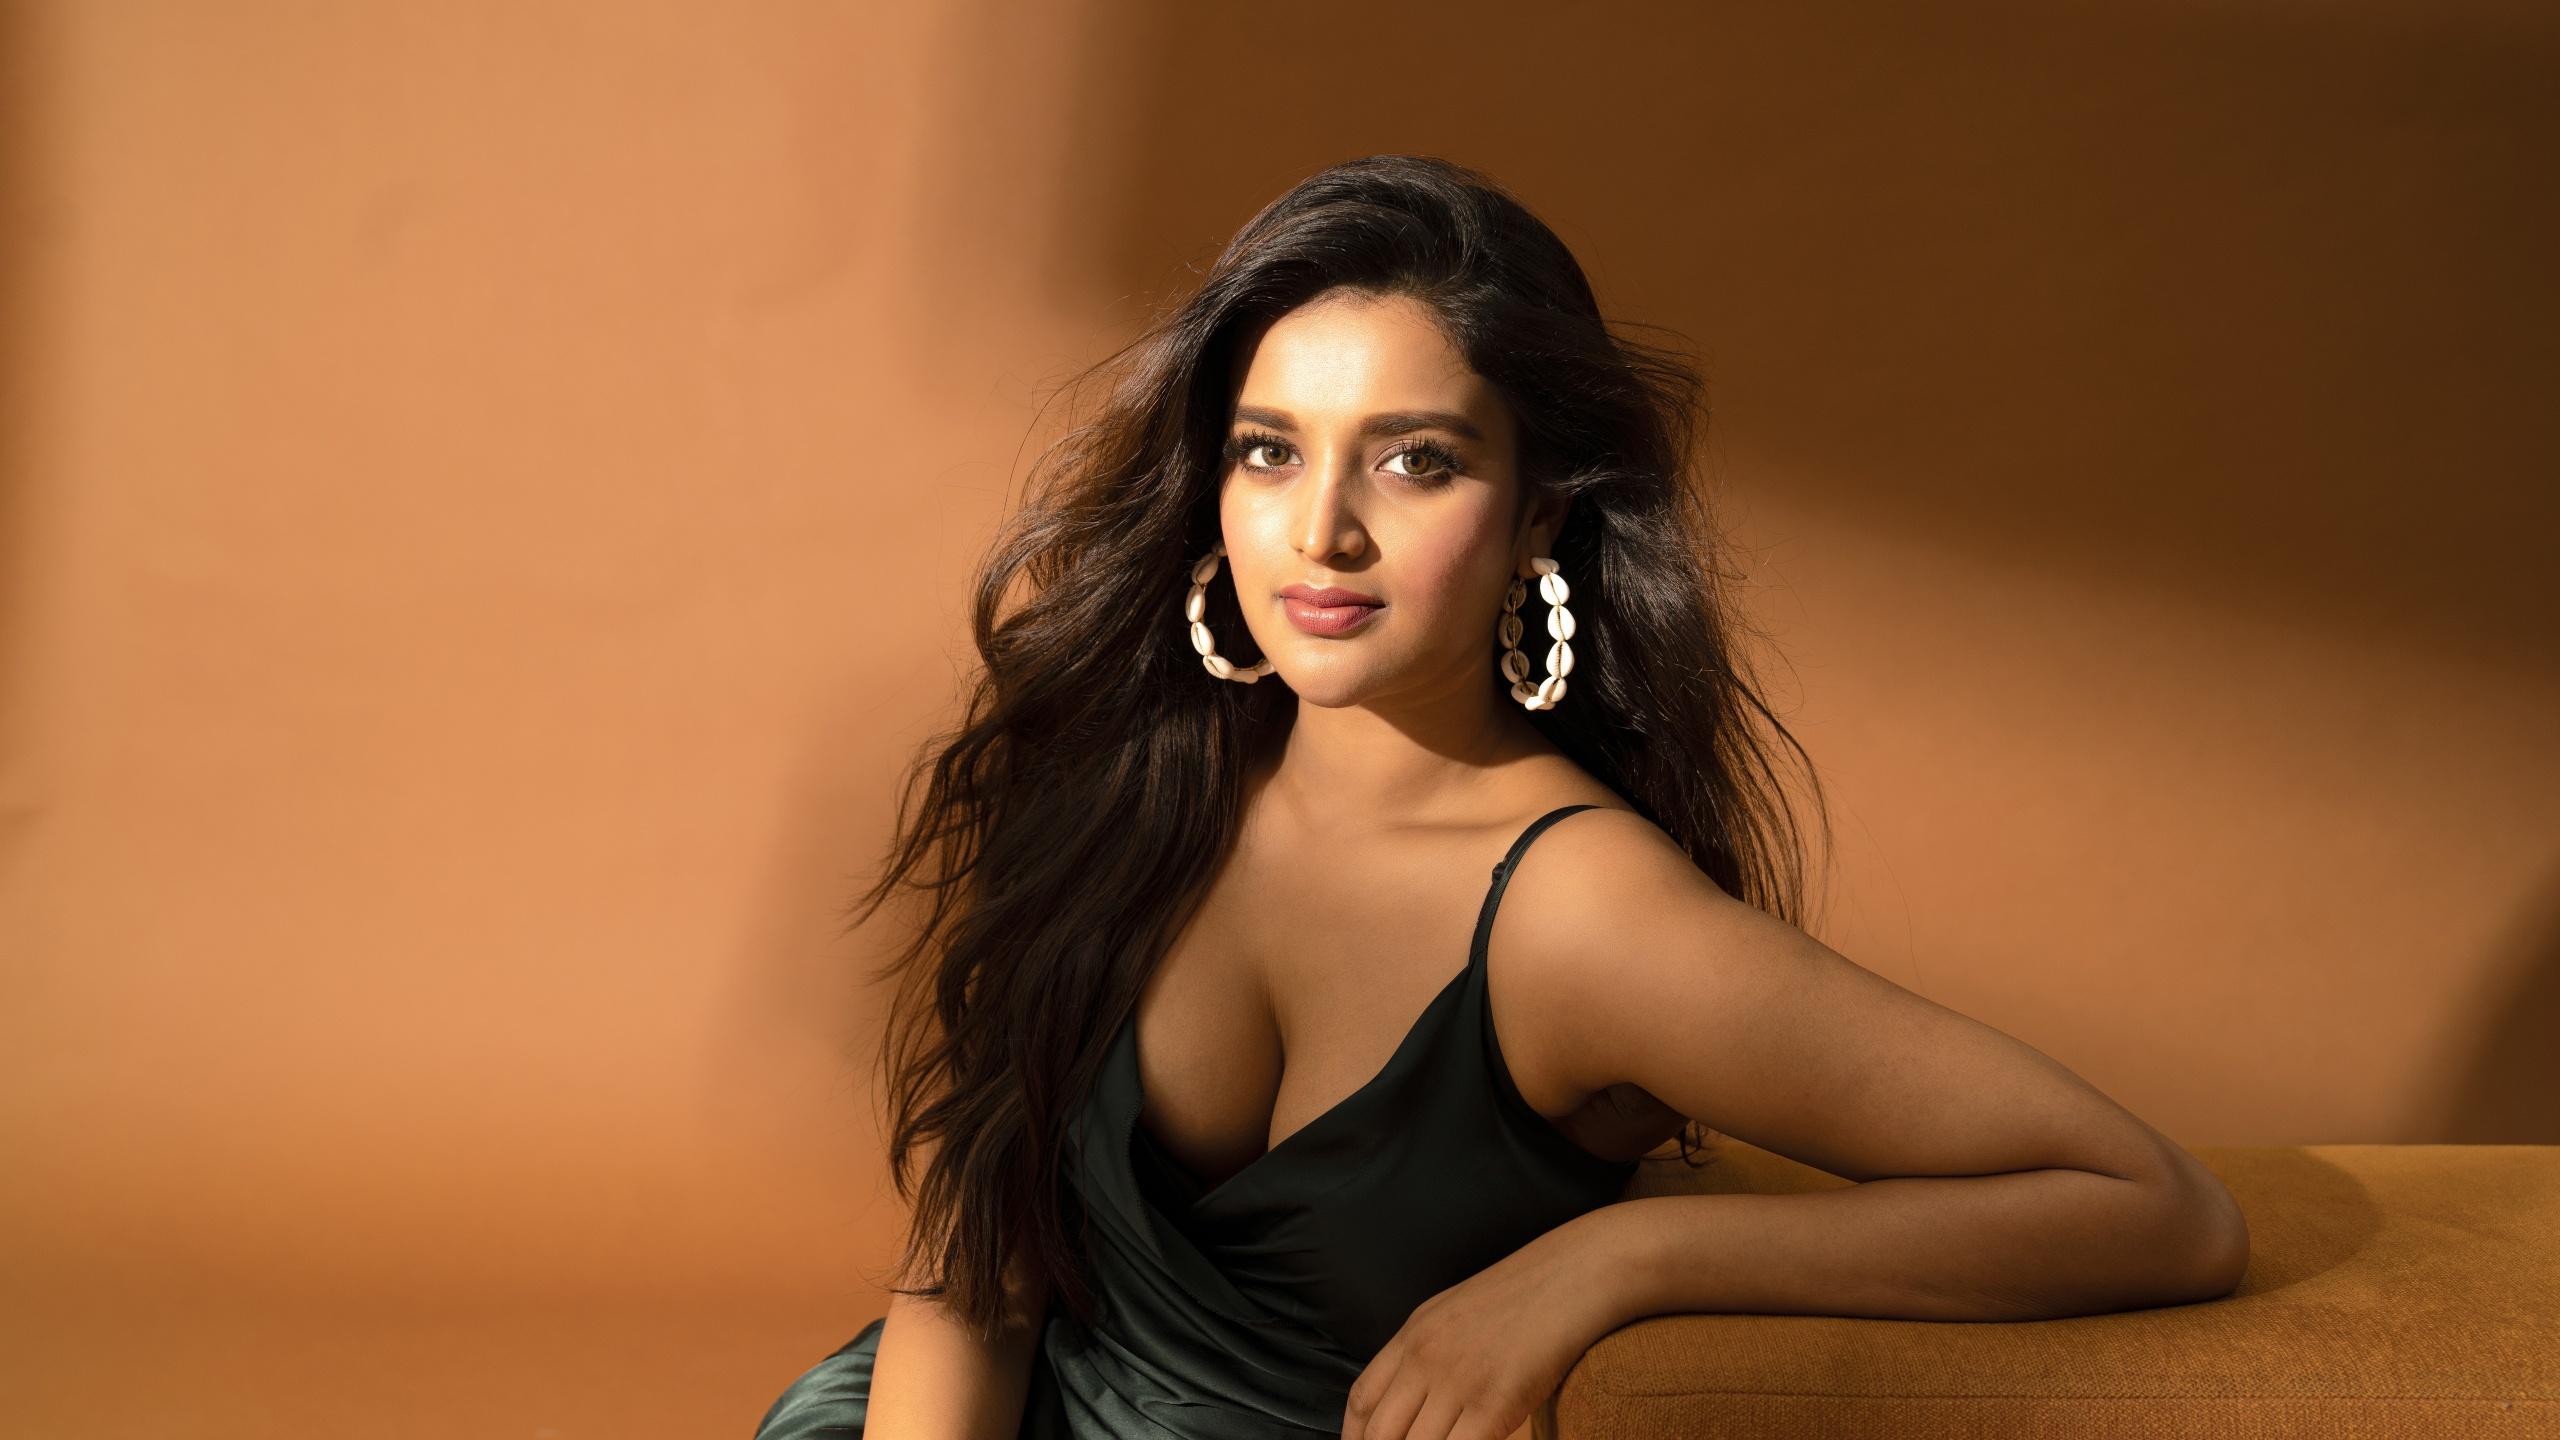 Nidhhi Agerwal Wallpaper 4k Indian Actress South Actress 5k 8k People 5439